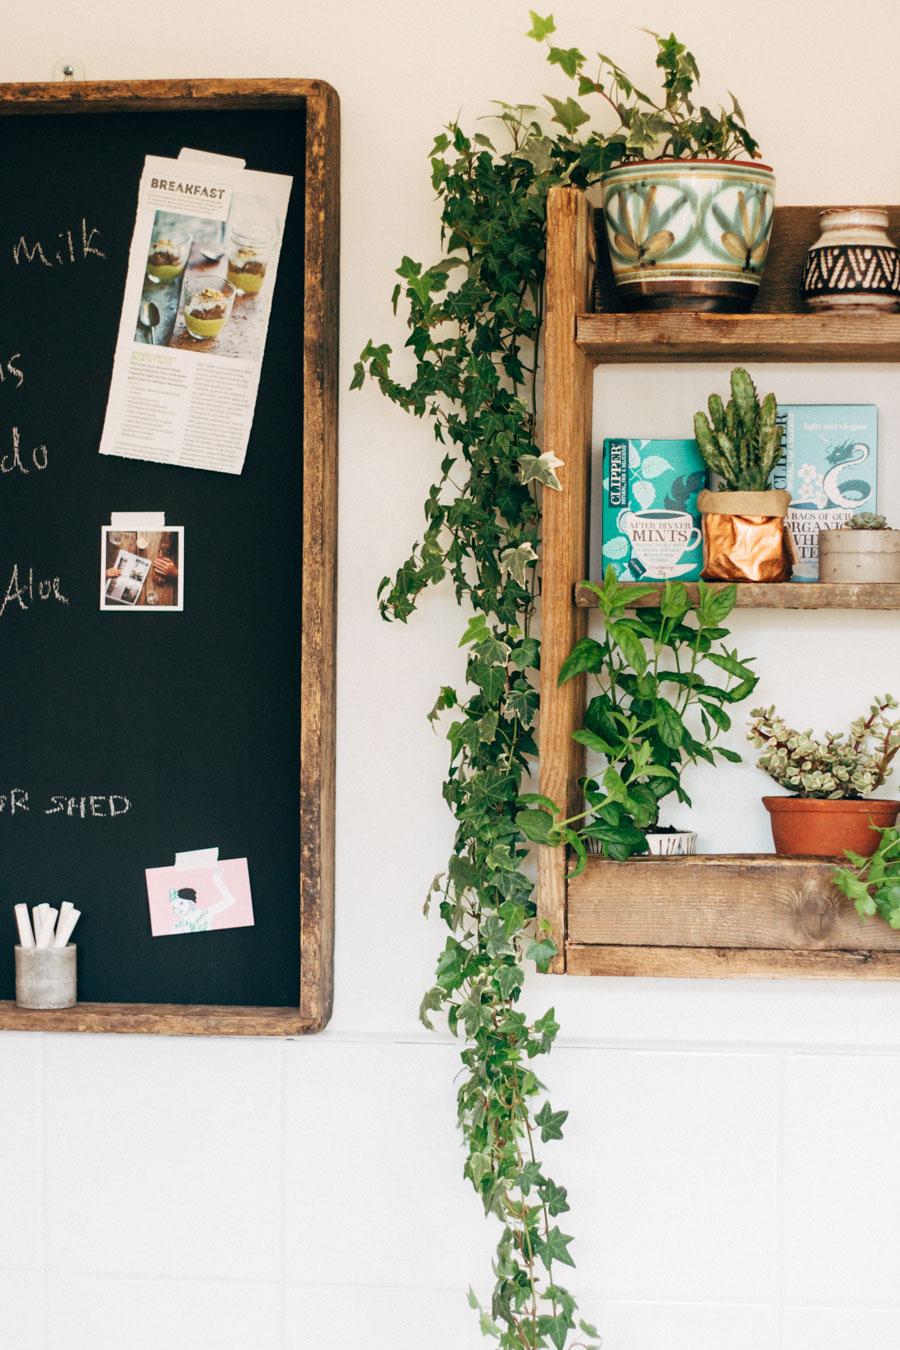 Growing Kitchen herbs